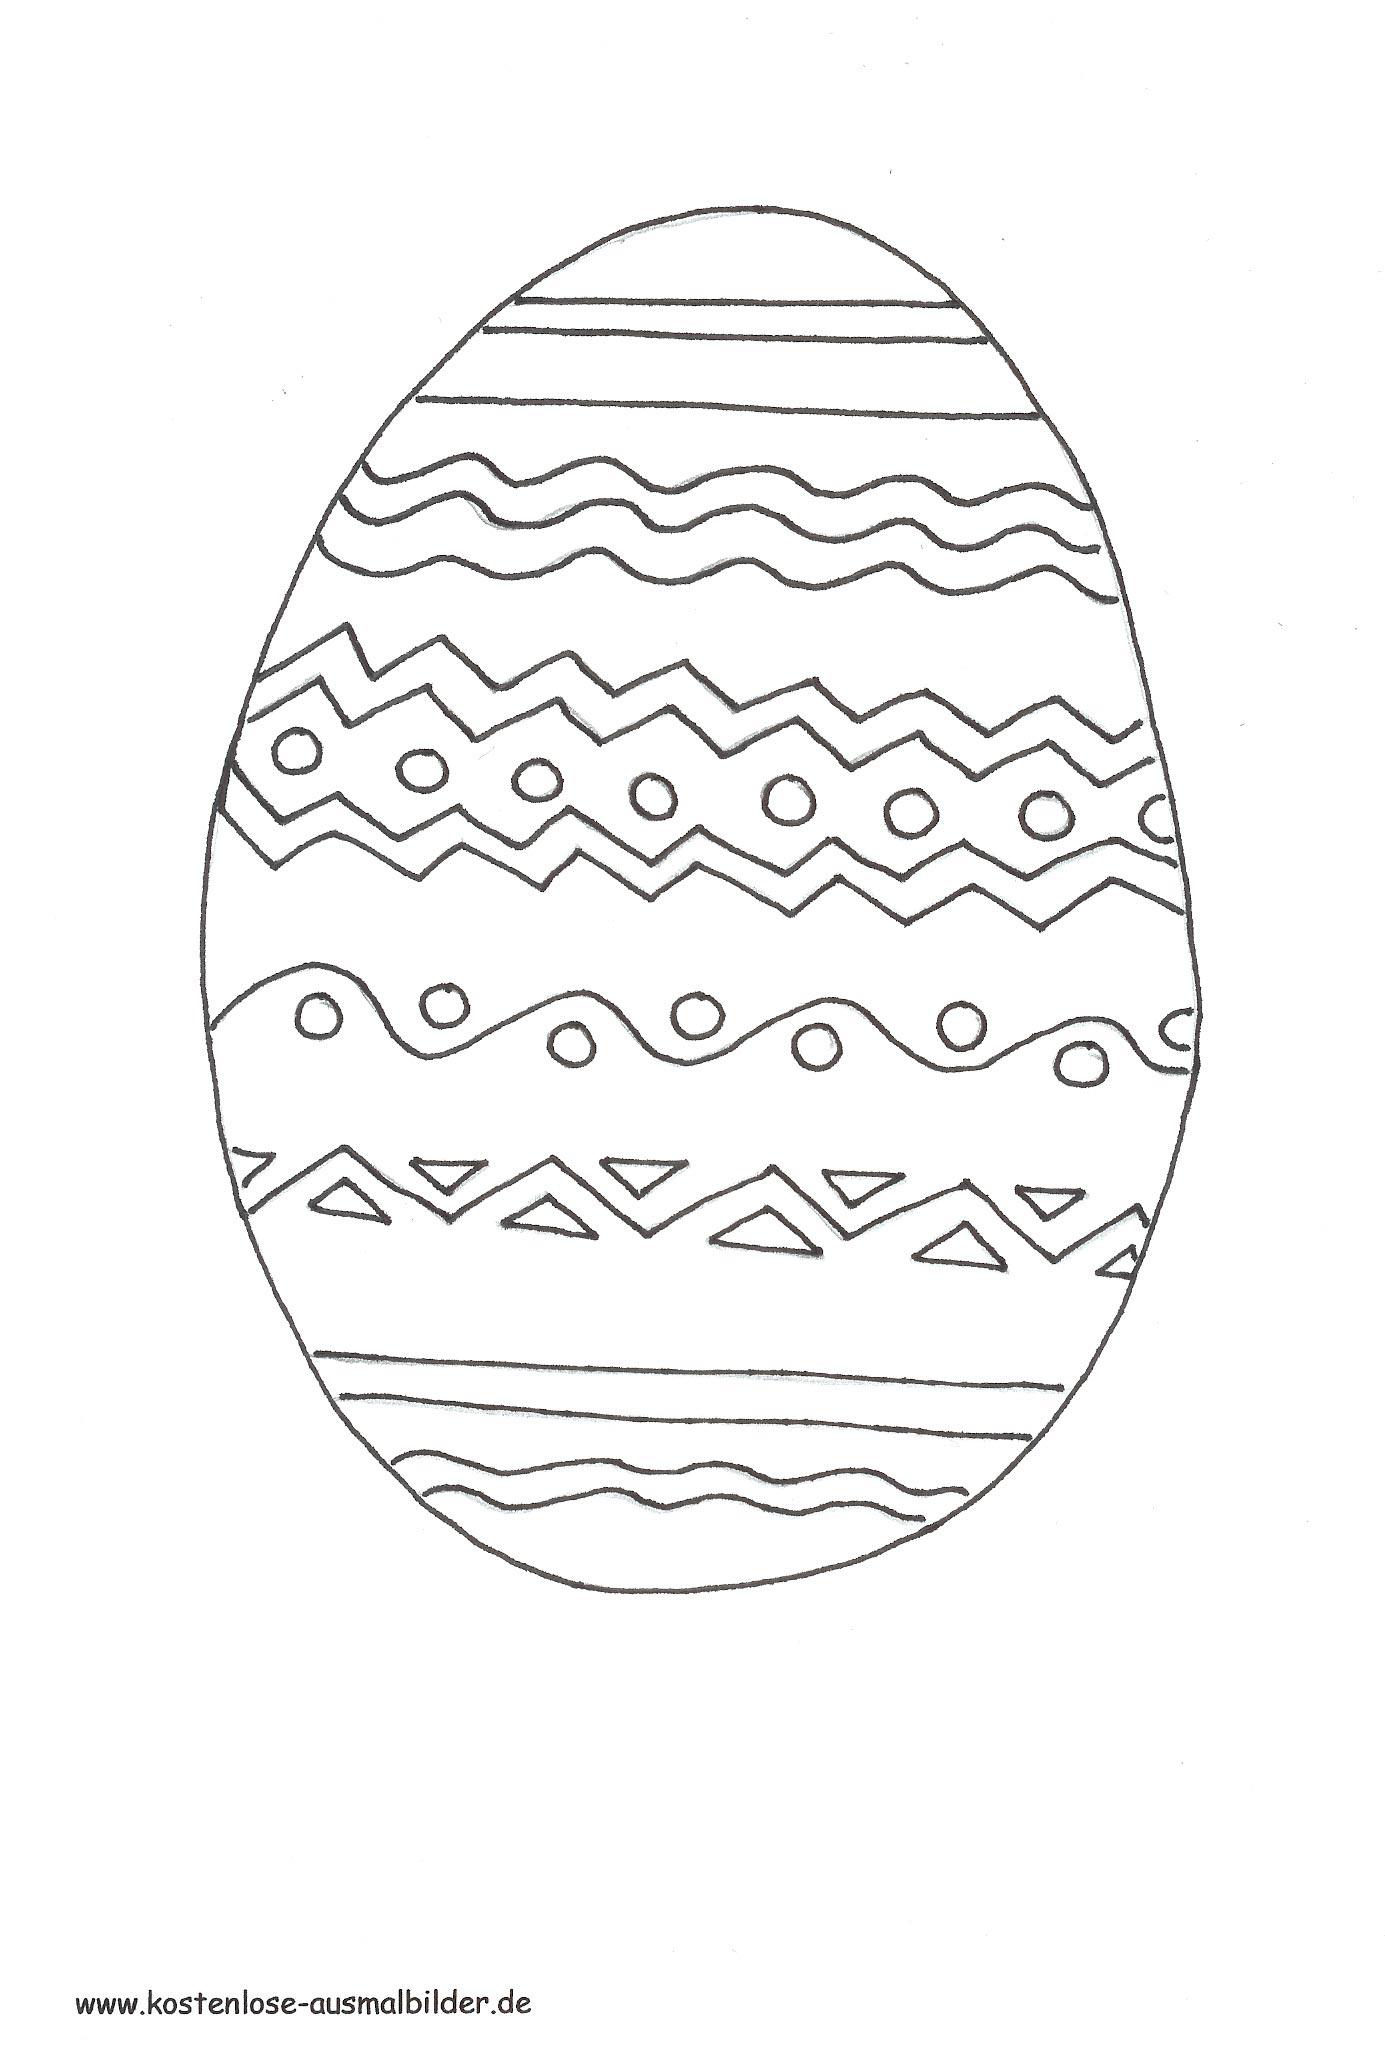 Ostern Ausmalbilder Ostern Ausmalbilder Ausmalen